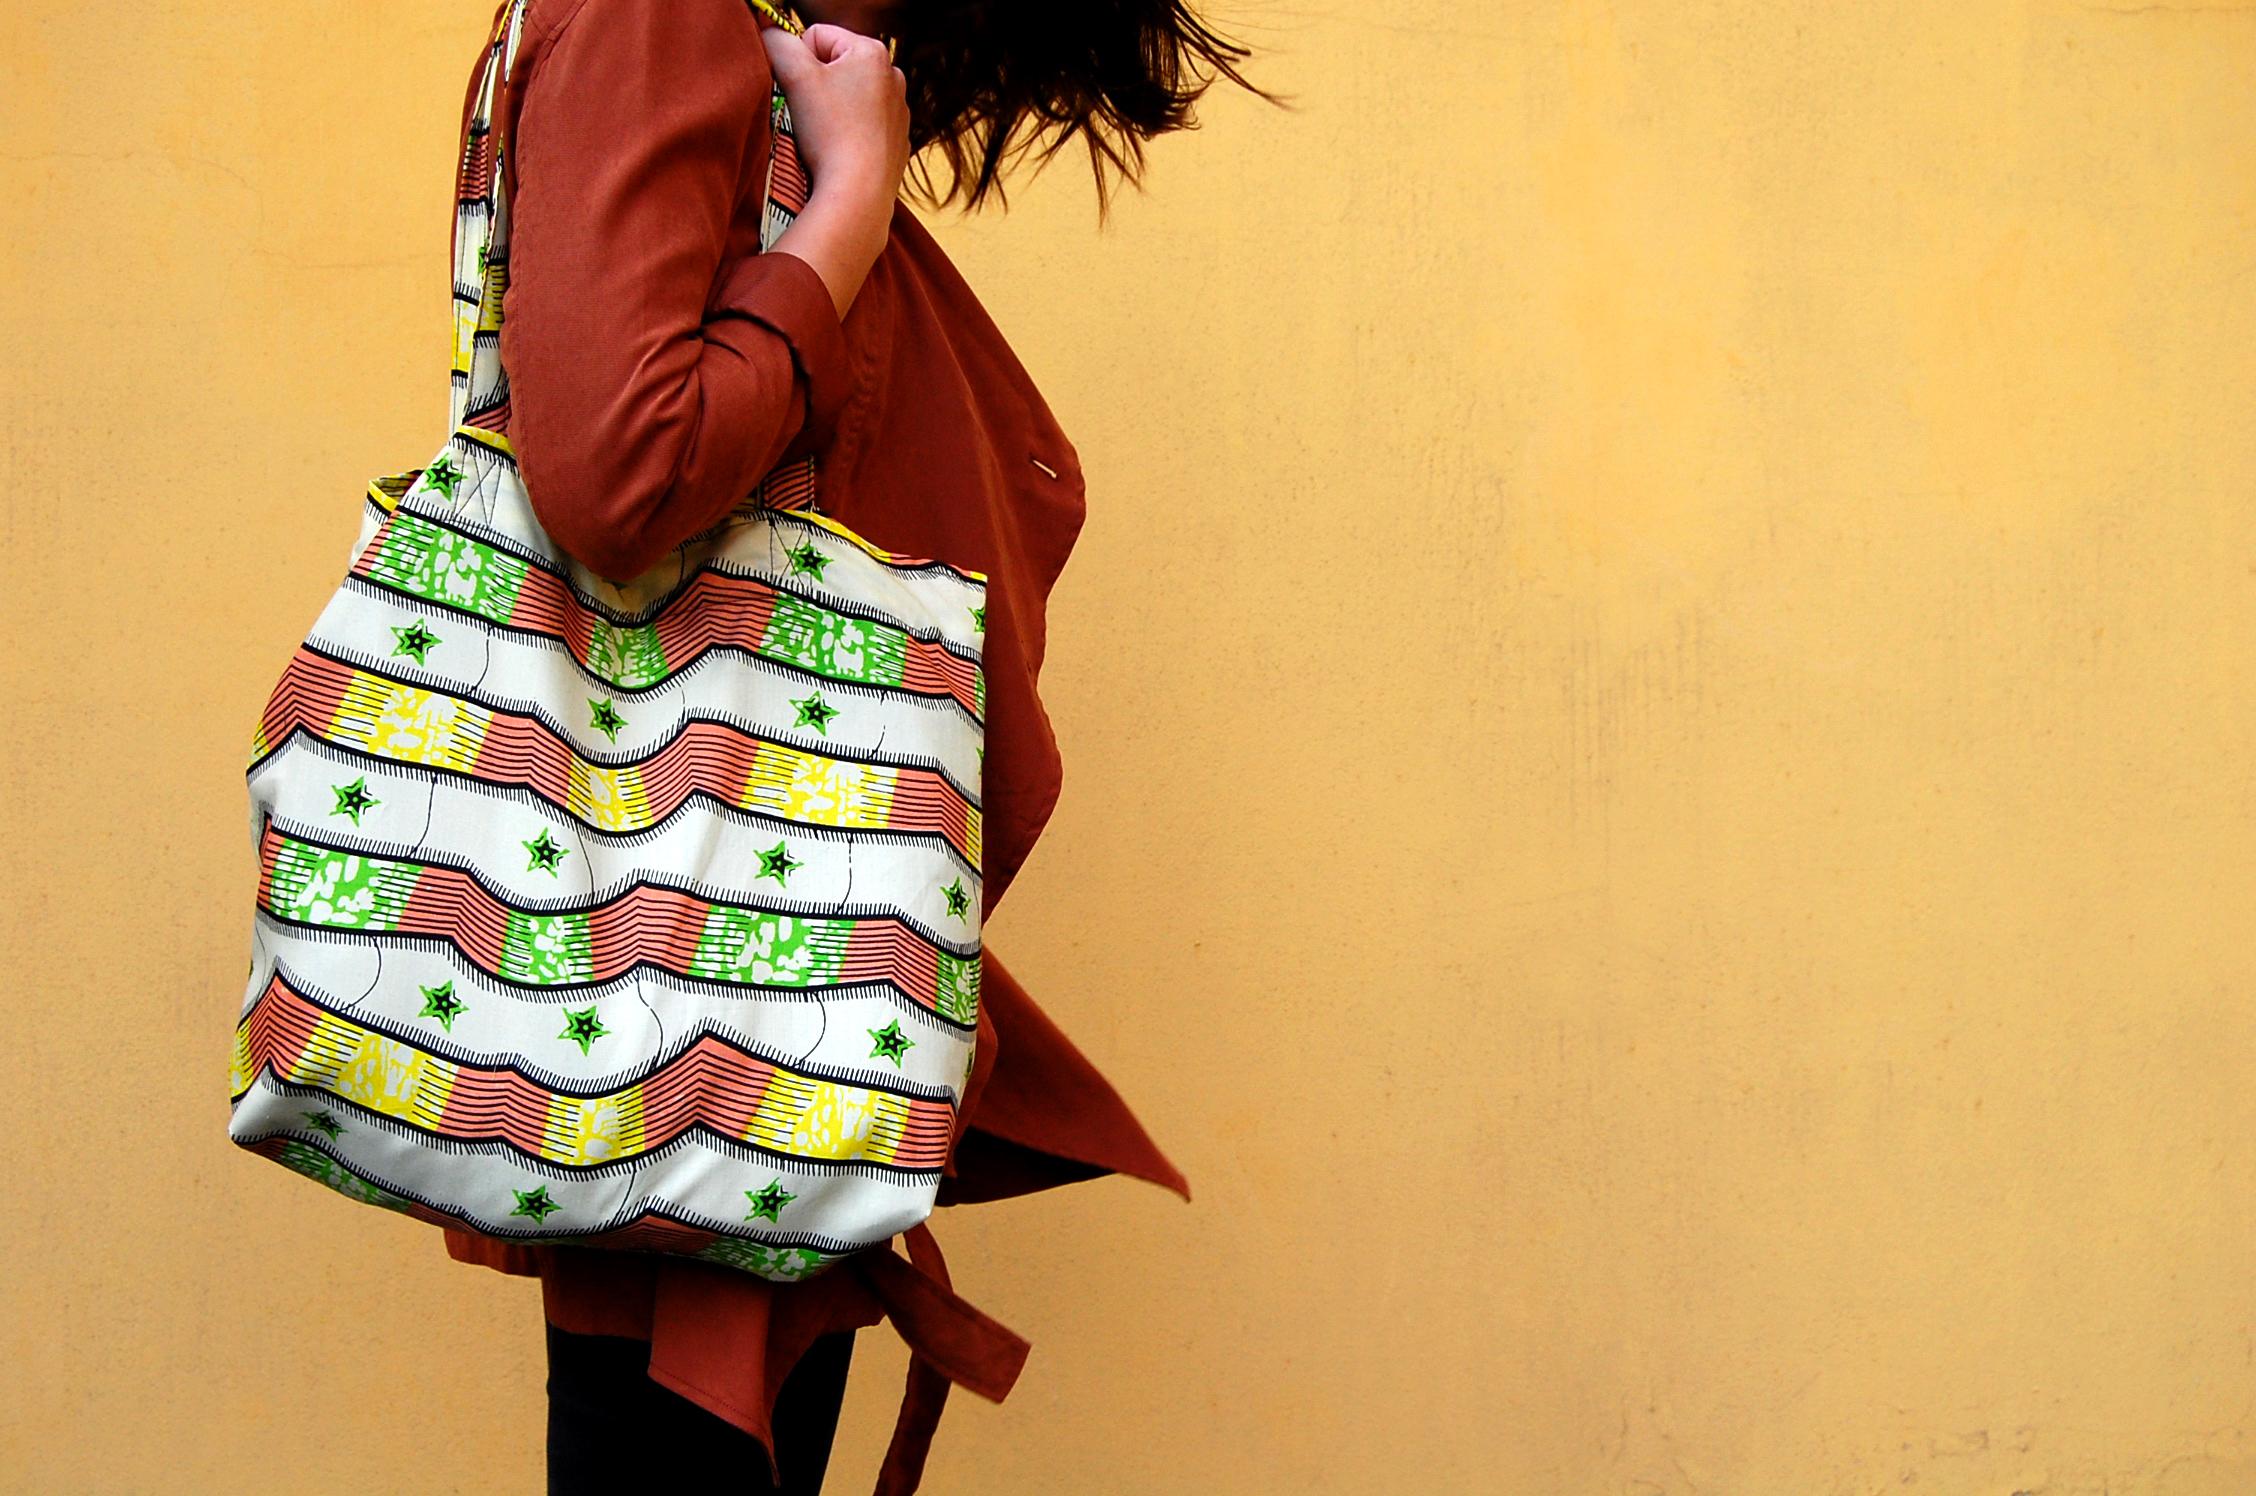 Stars & Stripes Bag